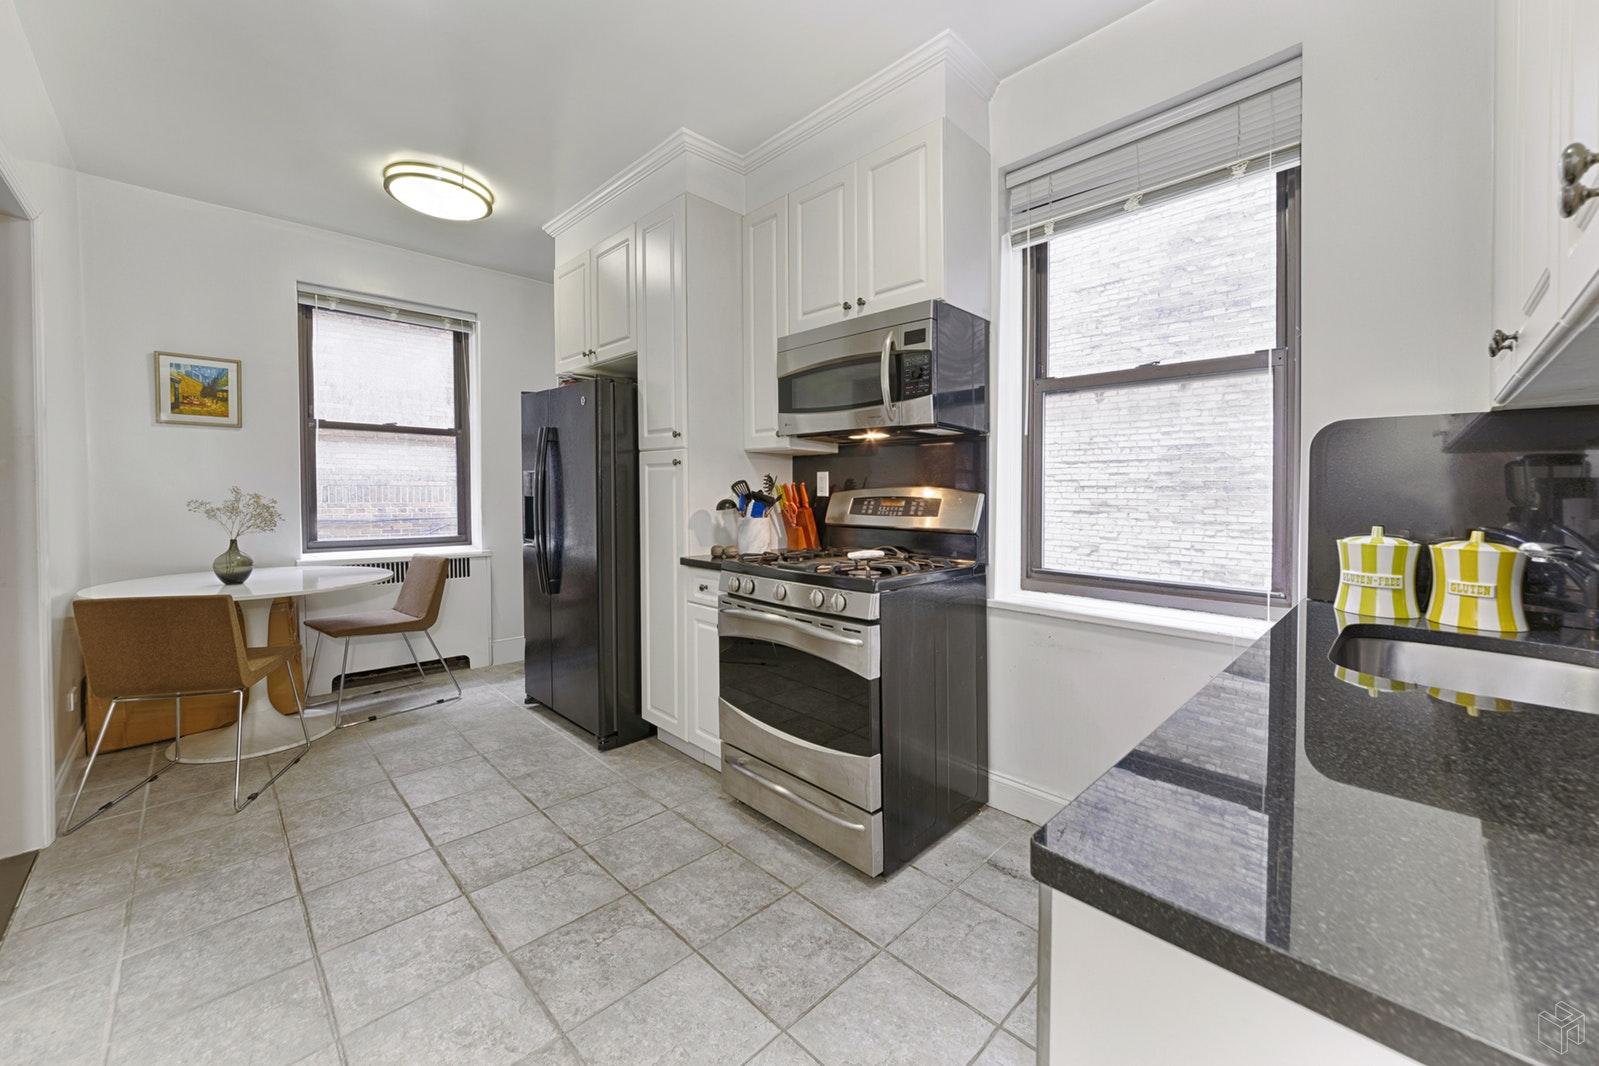 310 EAST 75TH STREET 1C, Upper East Side, $3,425, Web #: 19458421